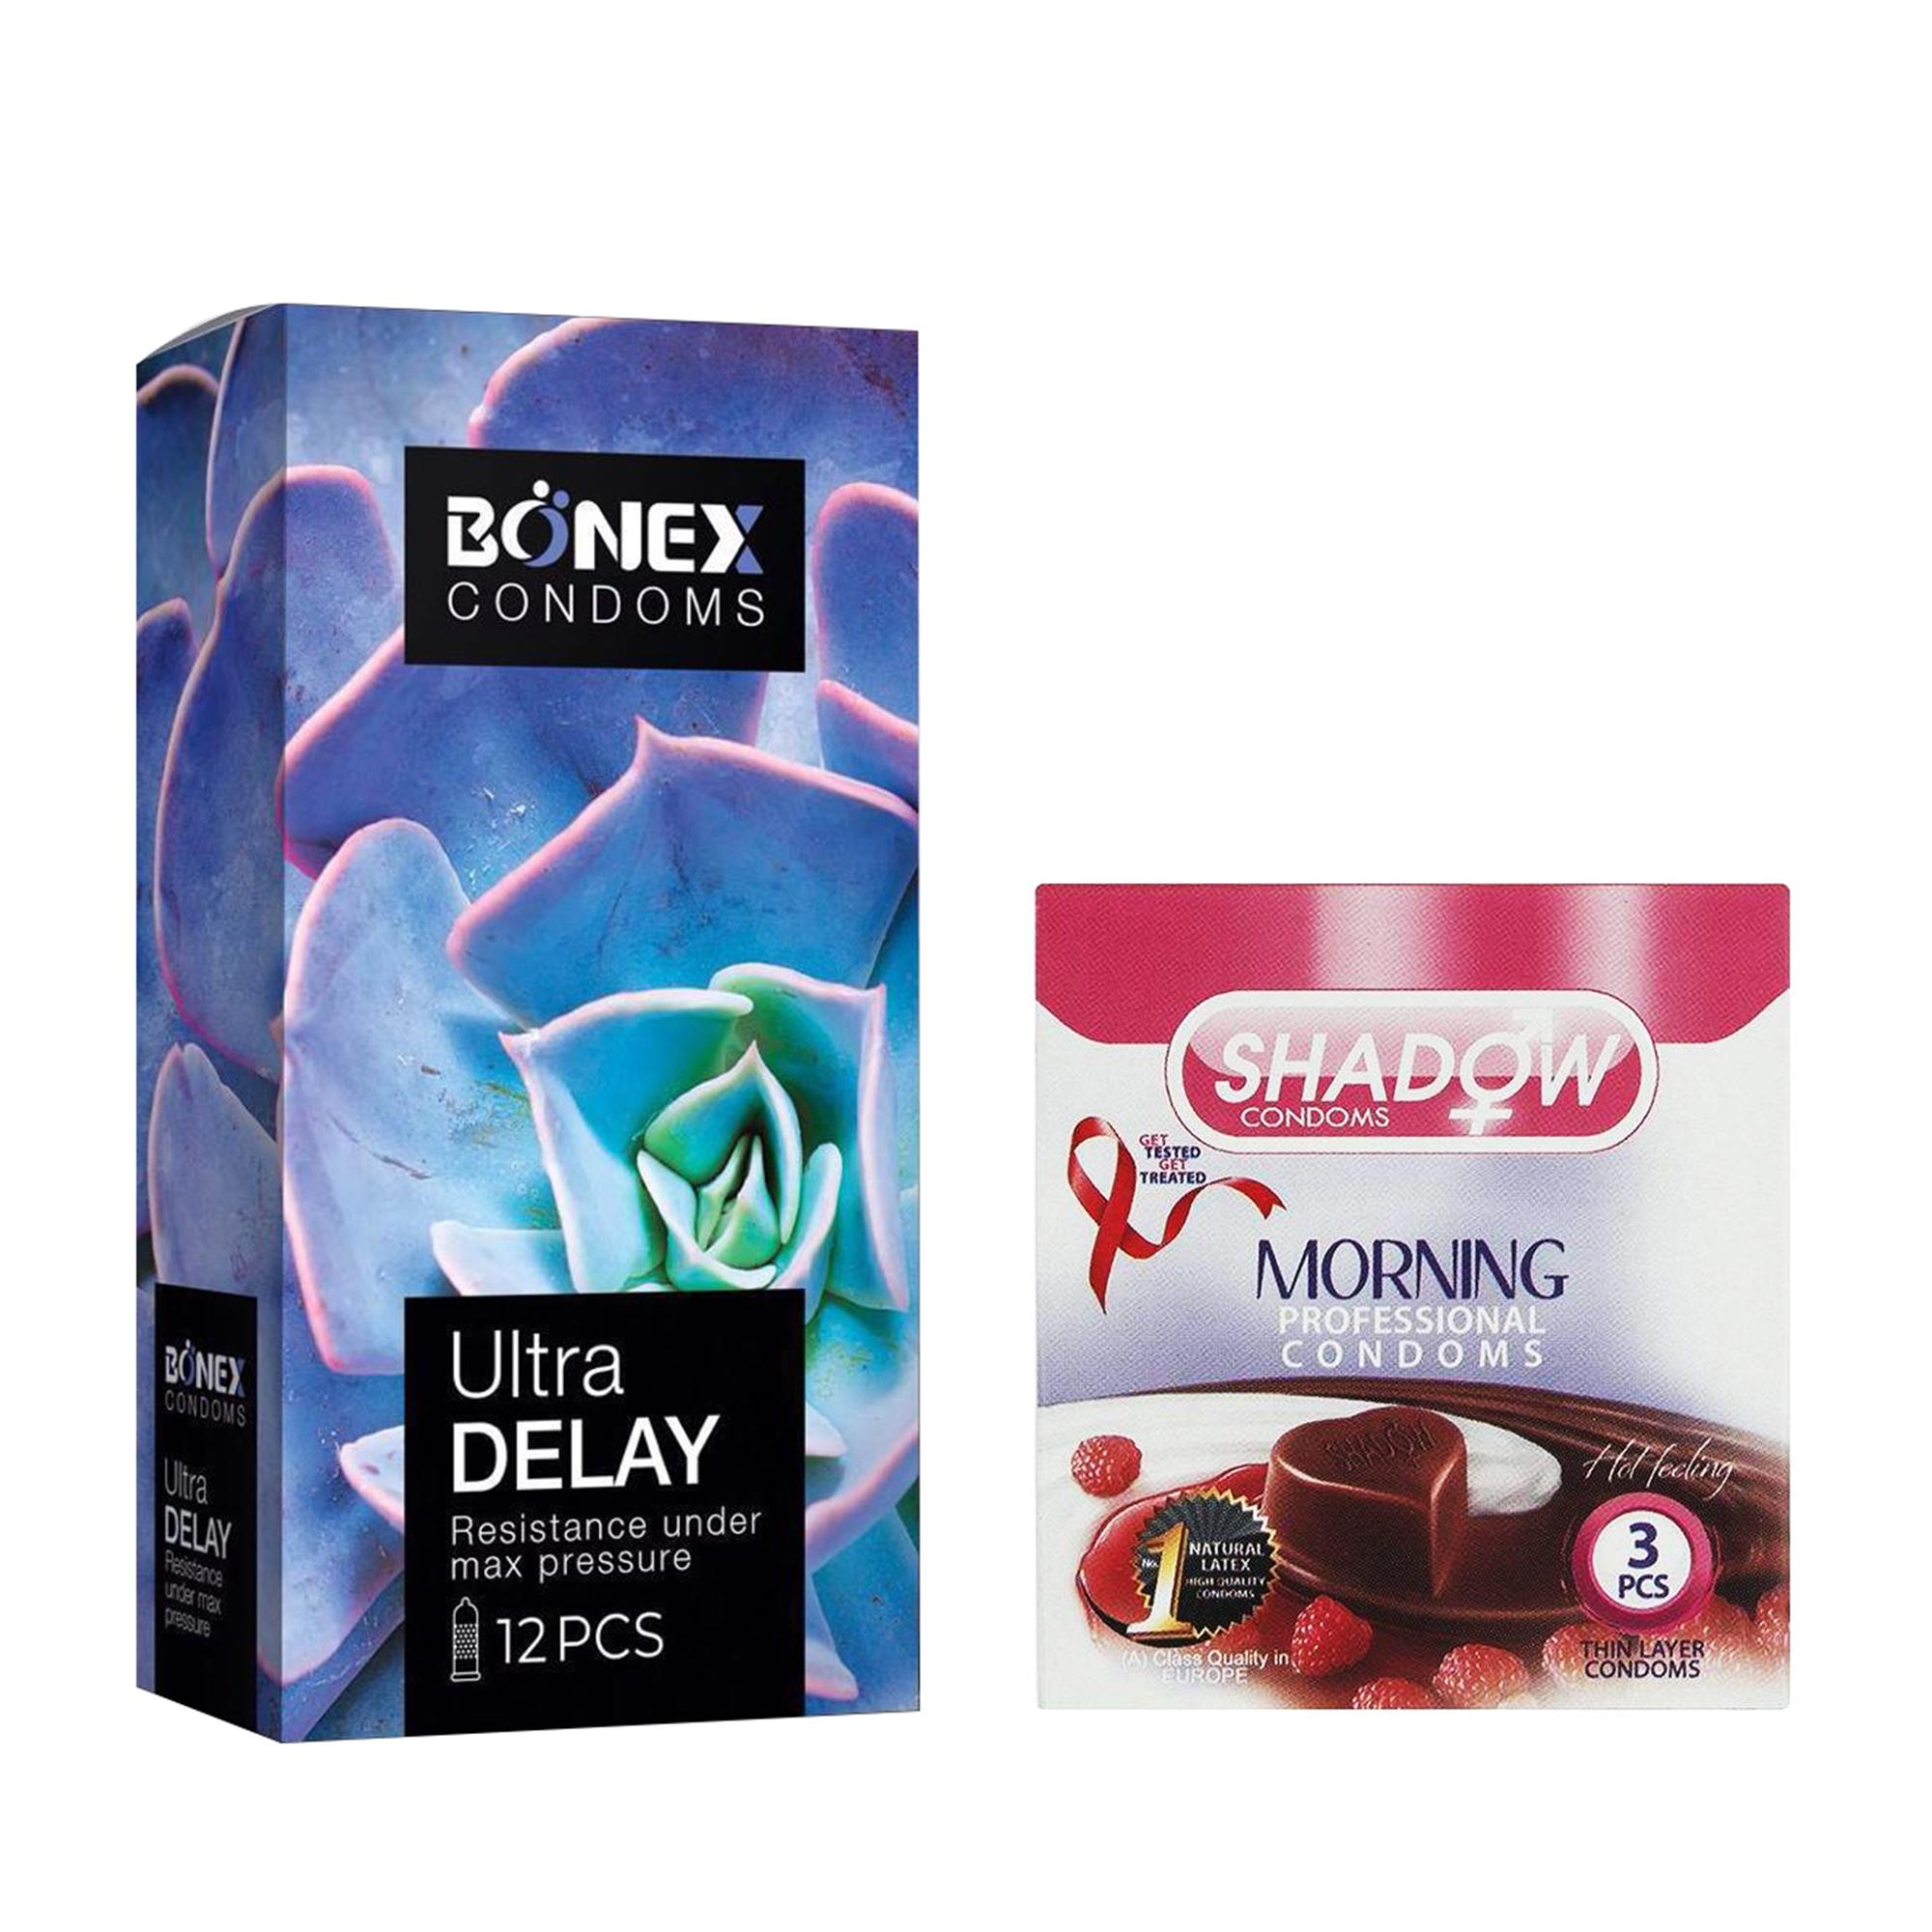 کاندوم بونکس مدل Ultra Delay بسته 12 عددی به همراه کاندوم شادو مدل Morning بسته 3 عددی